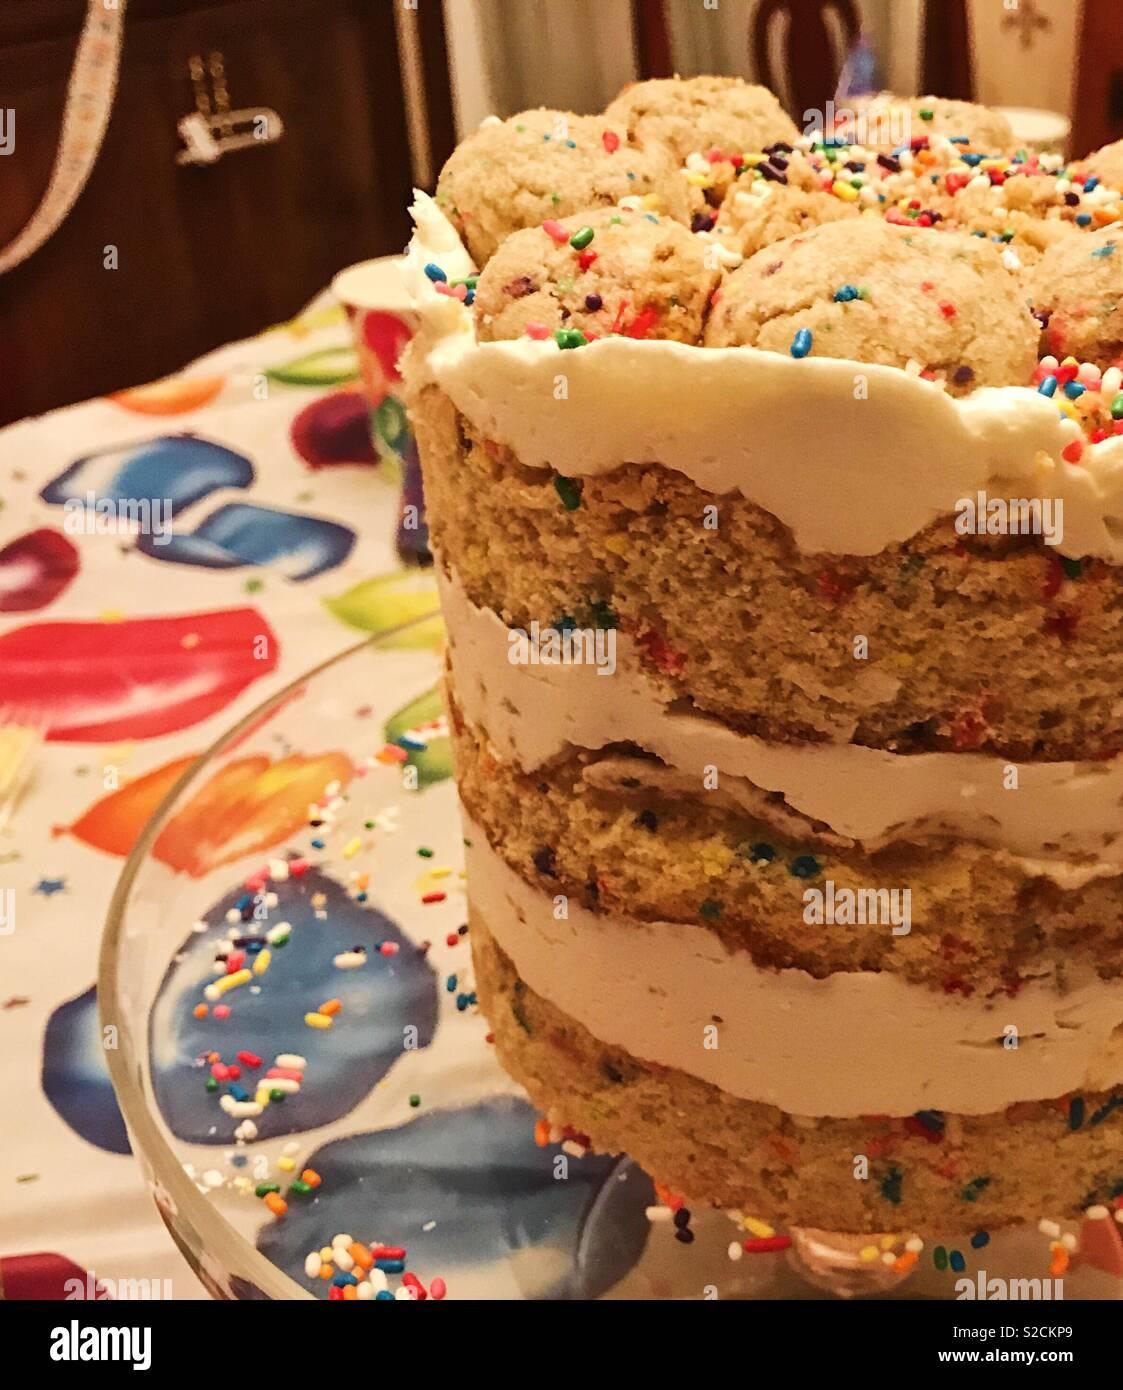 Groovy Beautiful Gourmet Three Layer Birthday Cake On Glass Cake Plate On Funny Birthday Cards Online Benoljebrpdamsfinfo